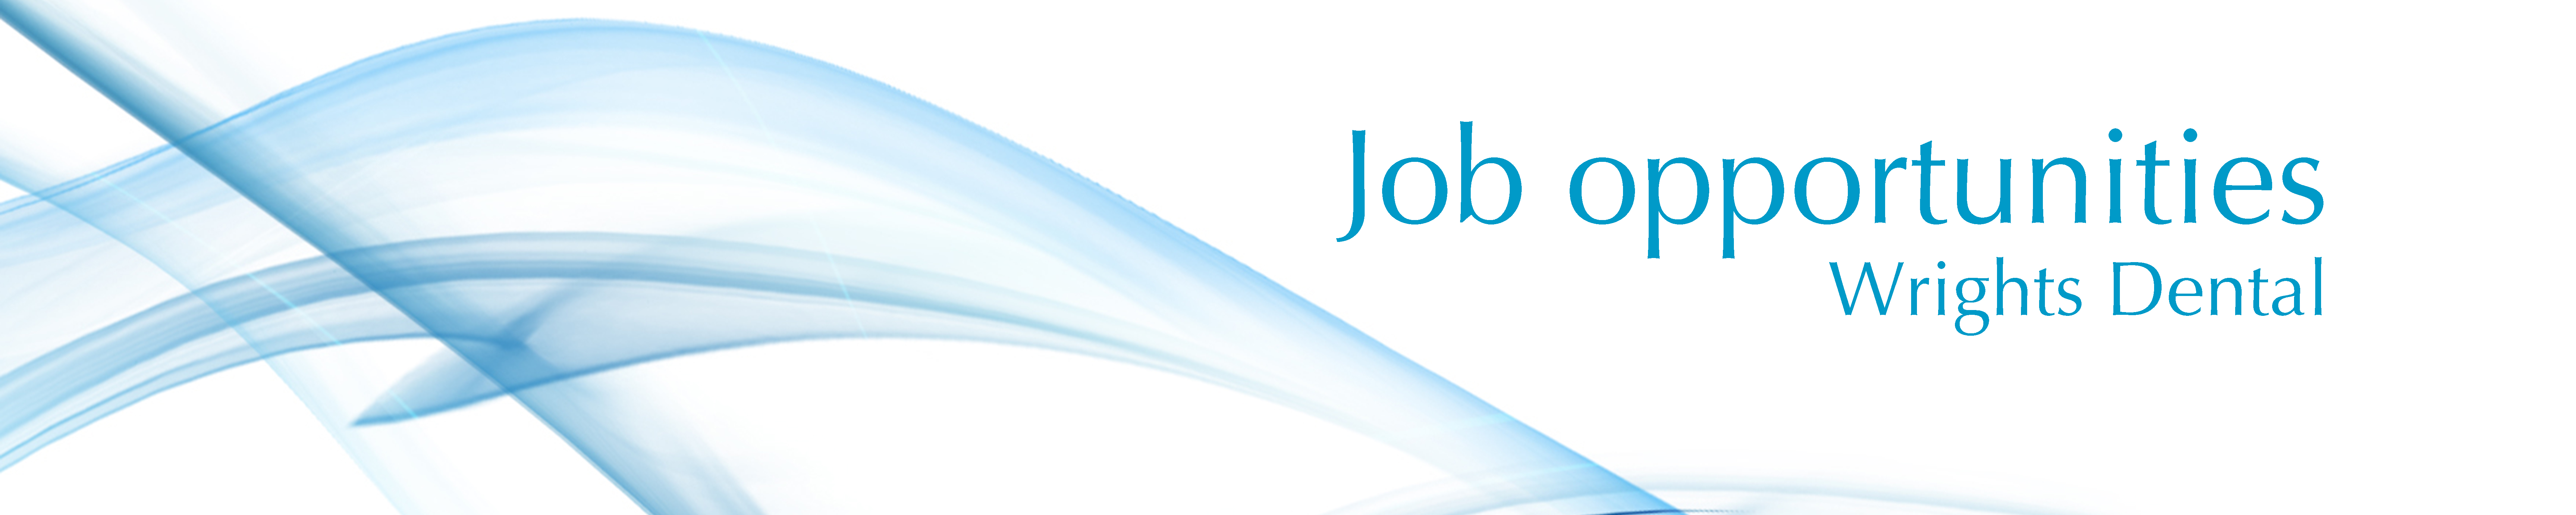 dental job opportunities